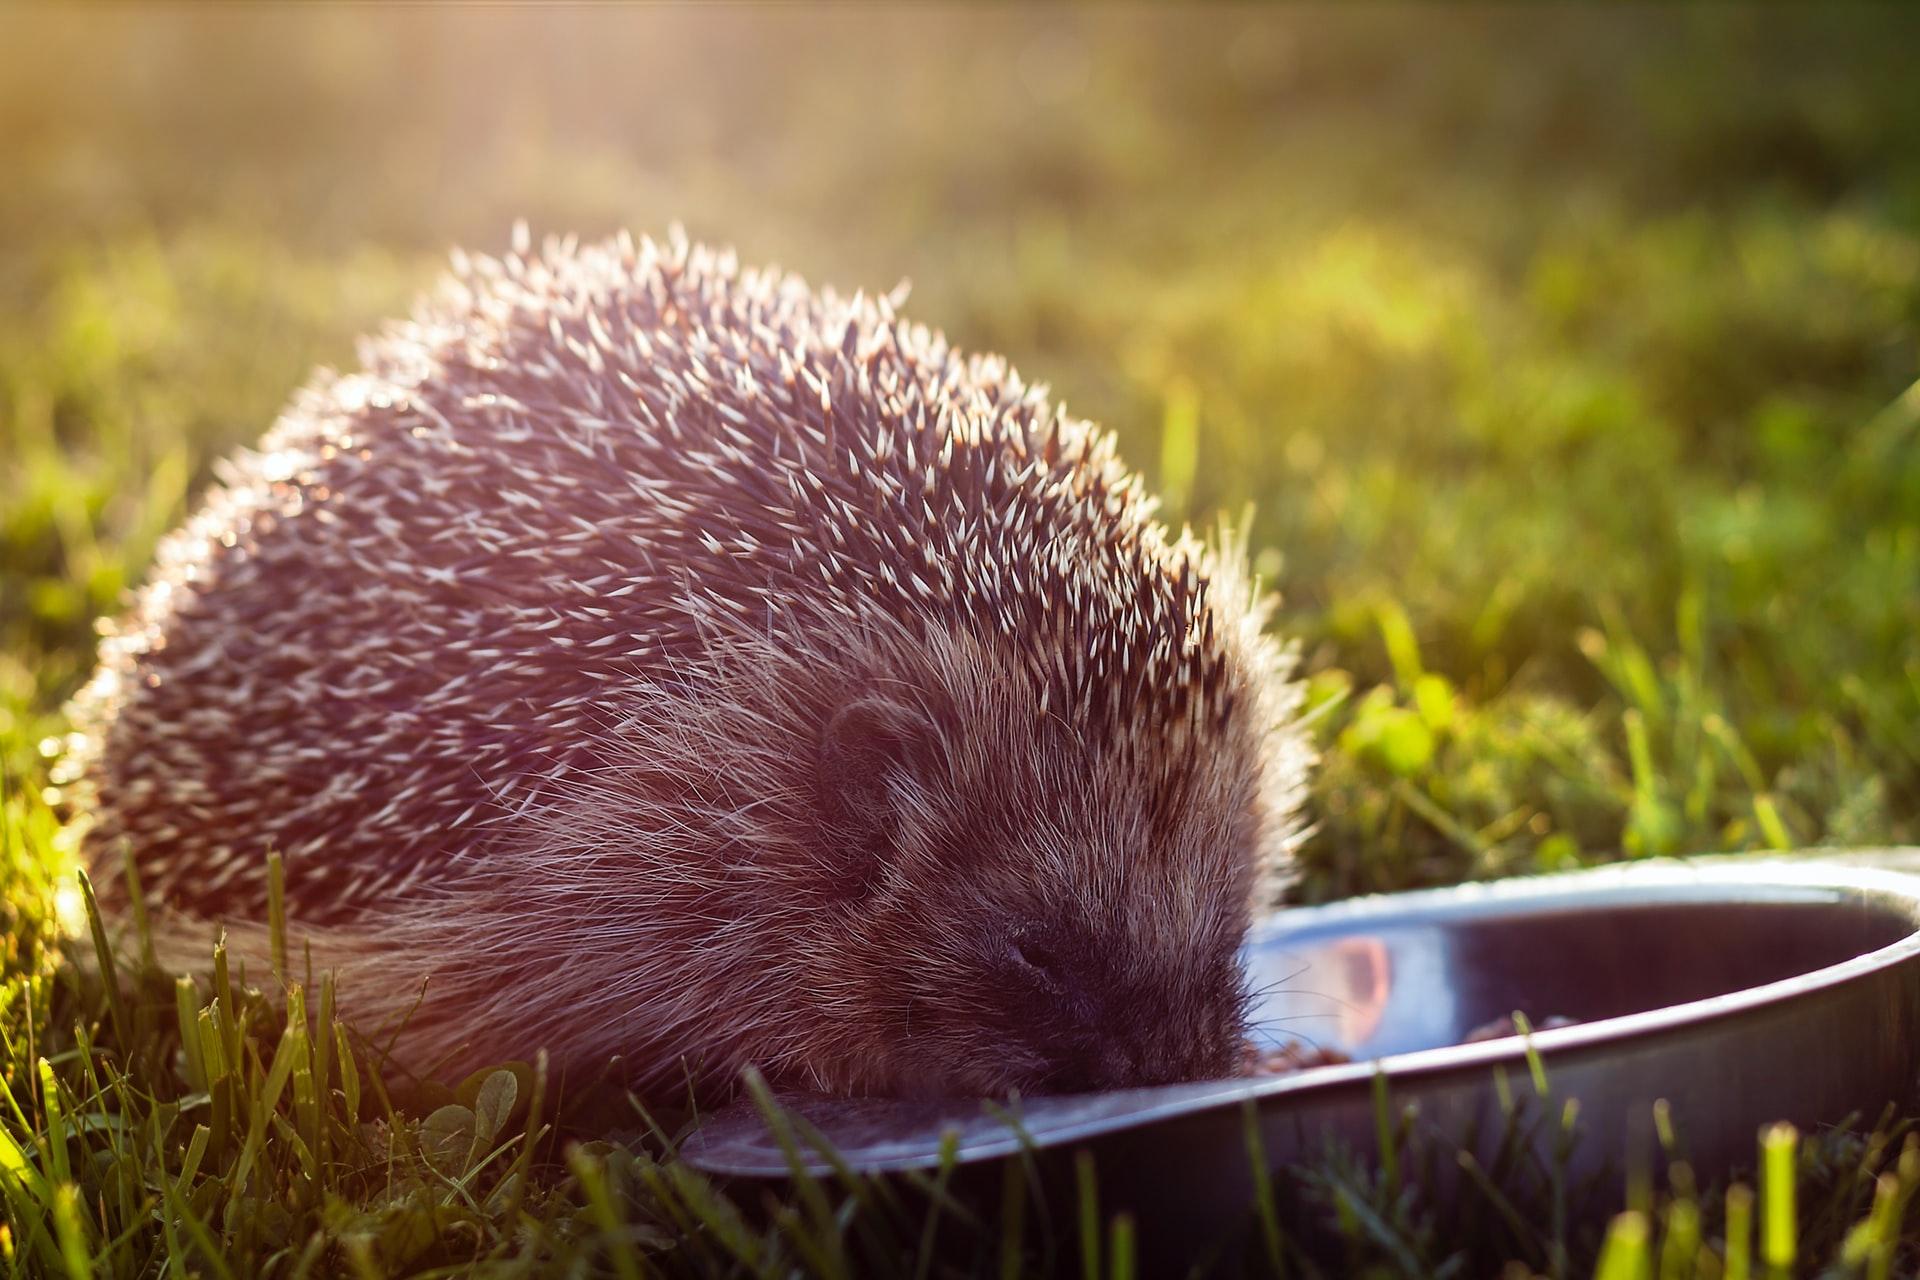 hedgehog eating from bowl